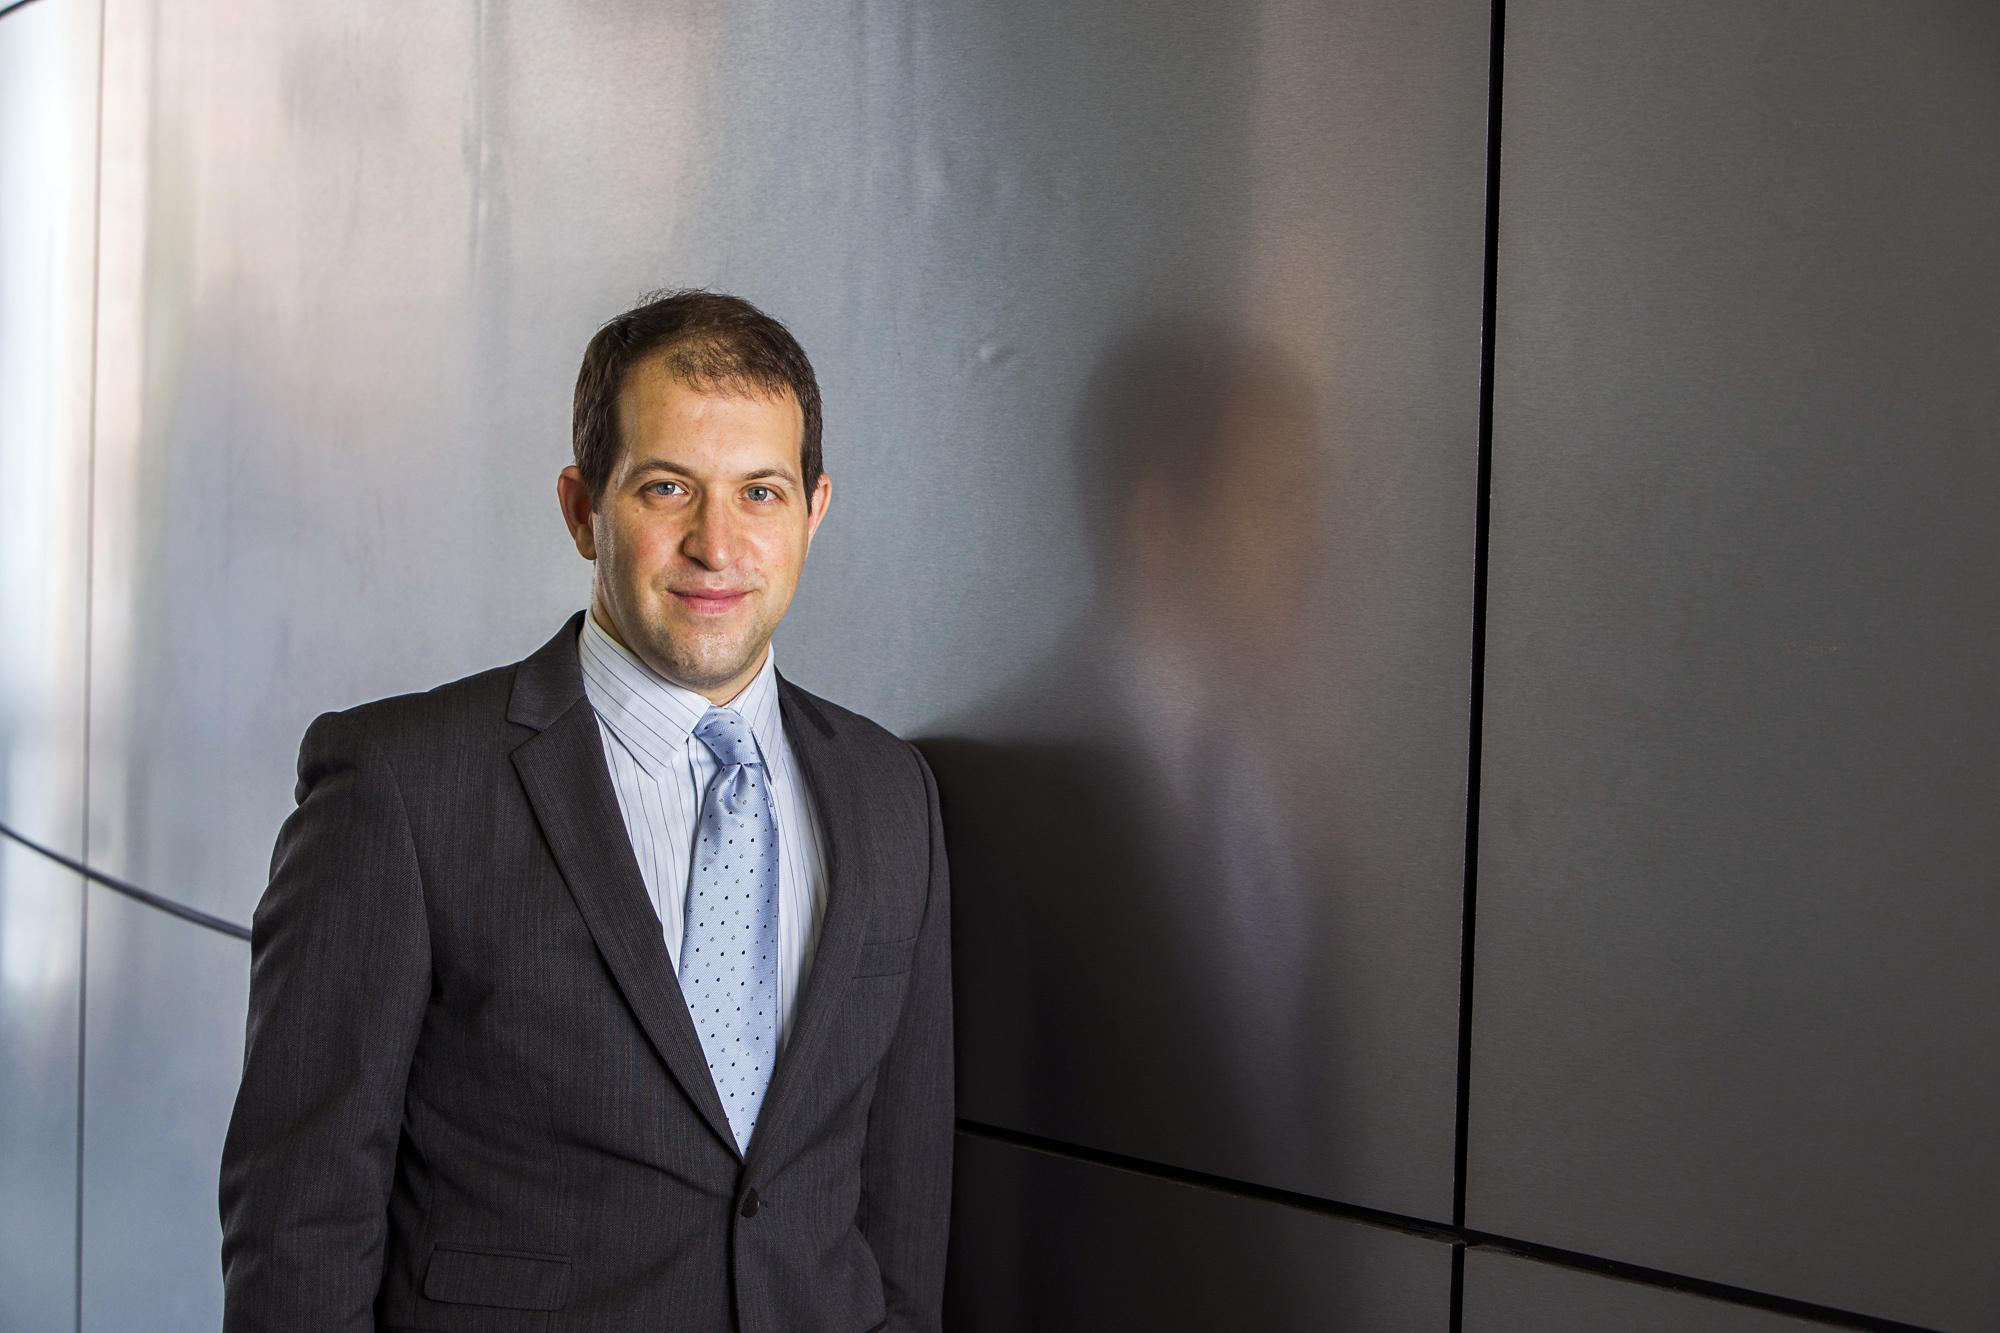 Dr Robert Michael Tumarkin